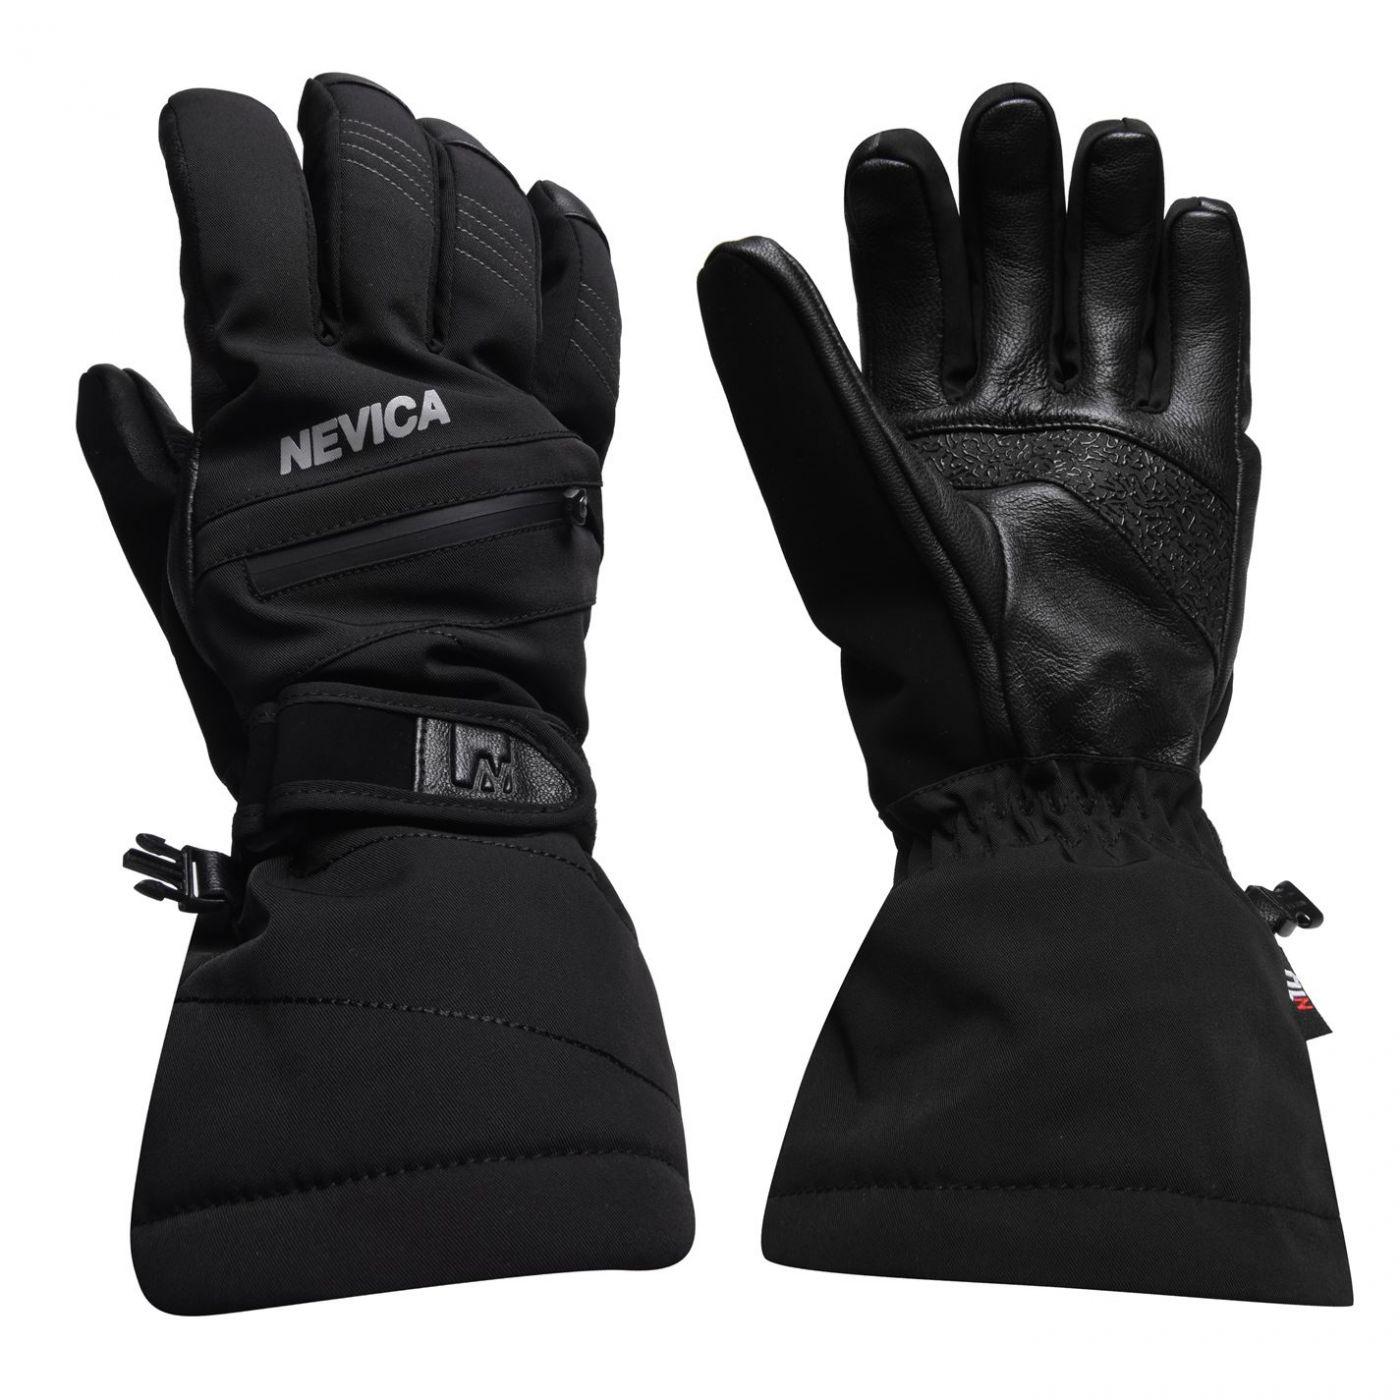 Nevica Vail Ski Gloves Mens